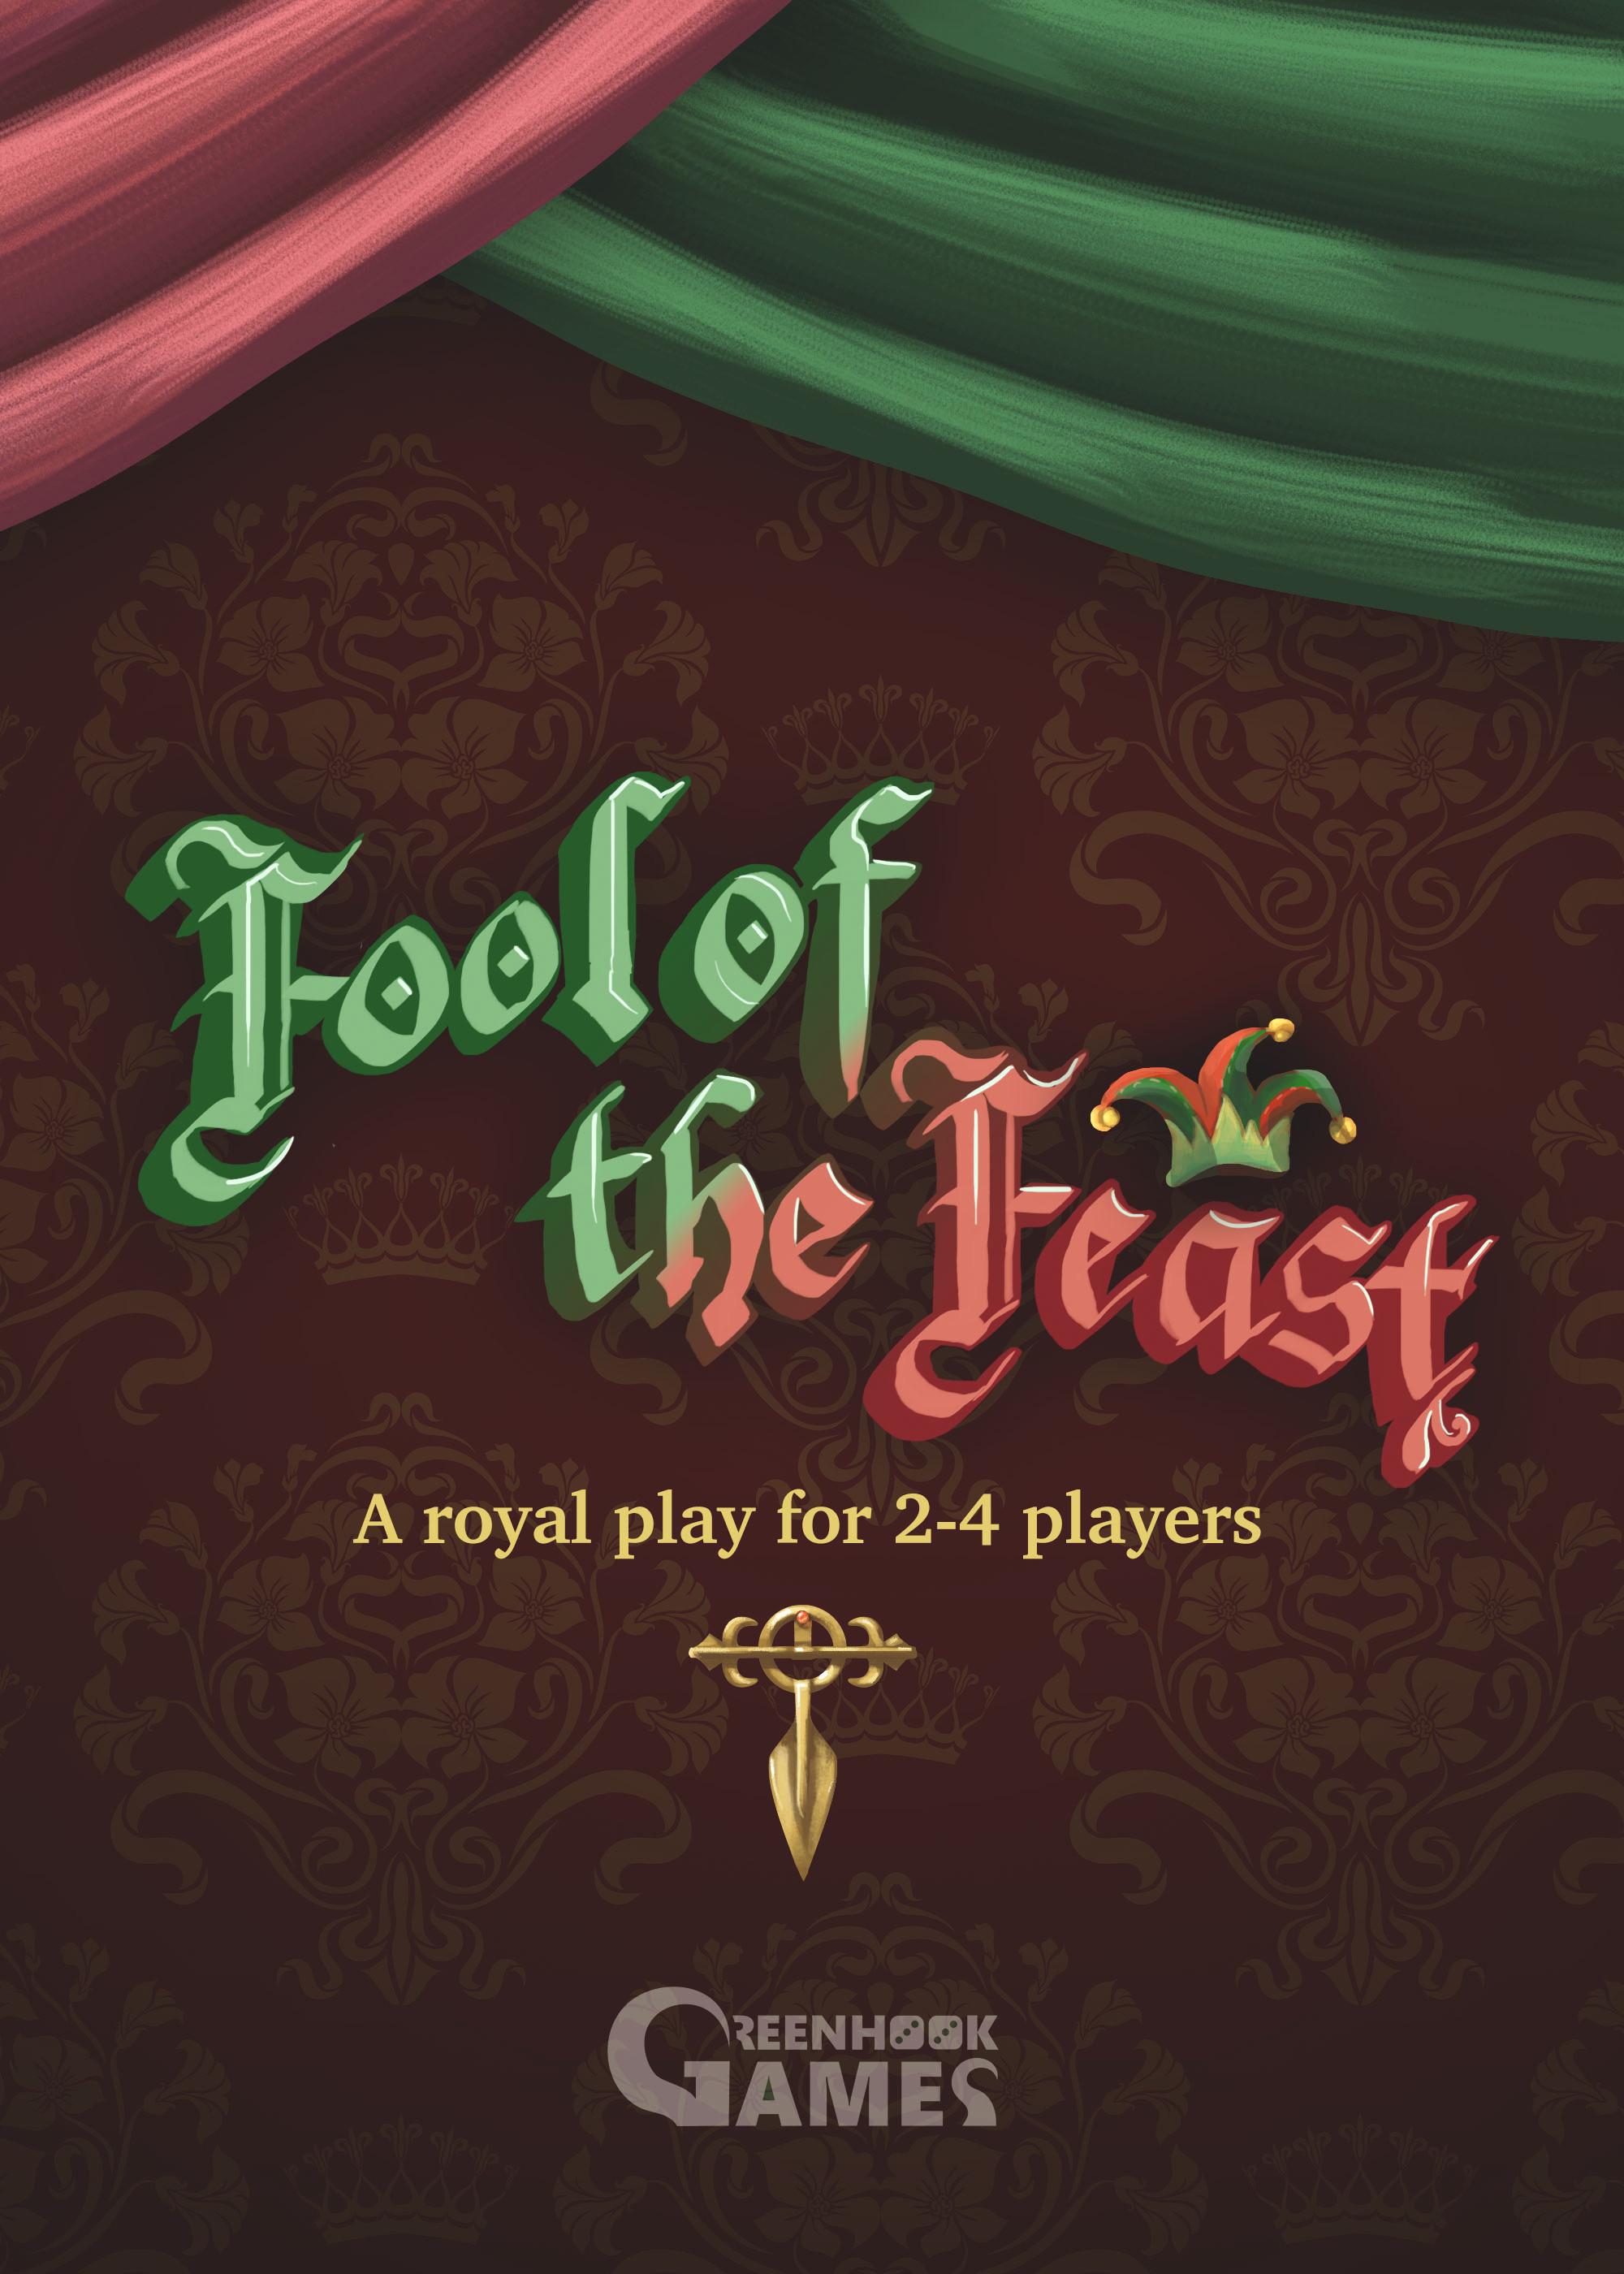 Fool of the Feast logo